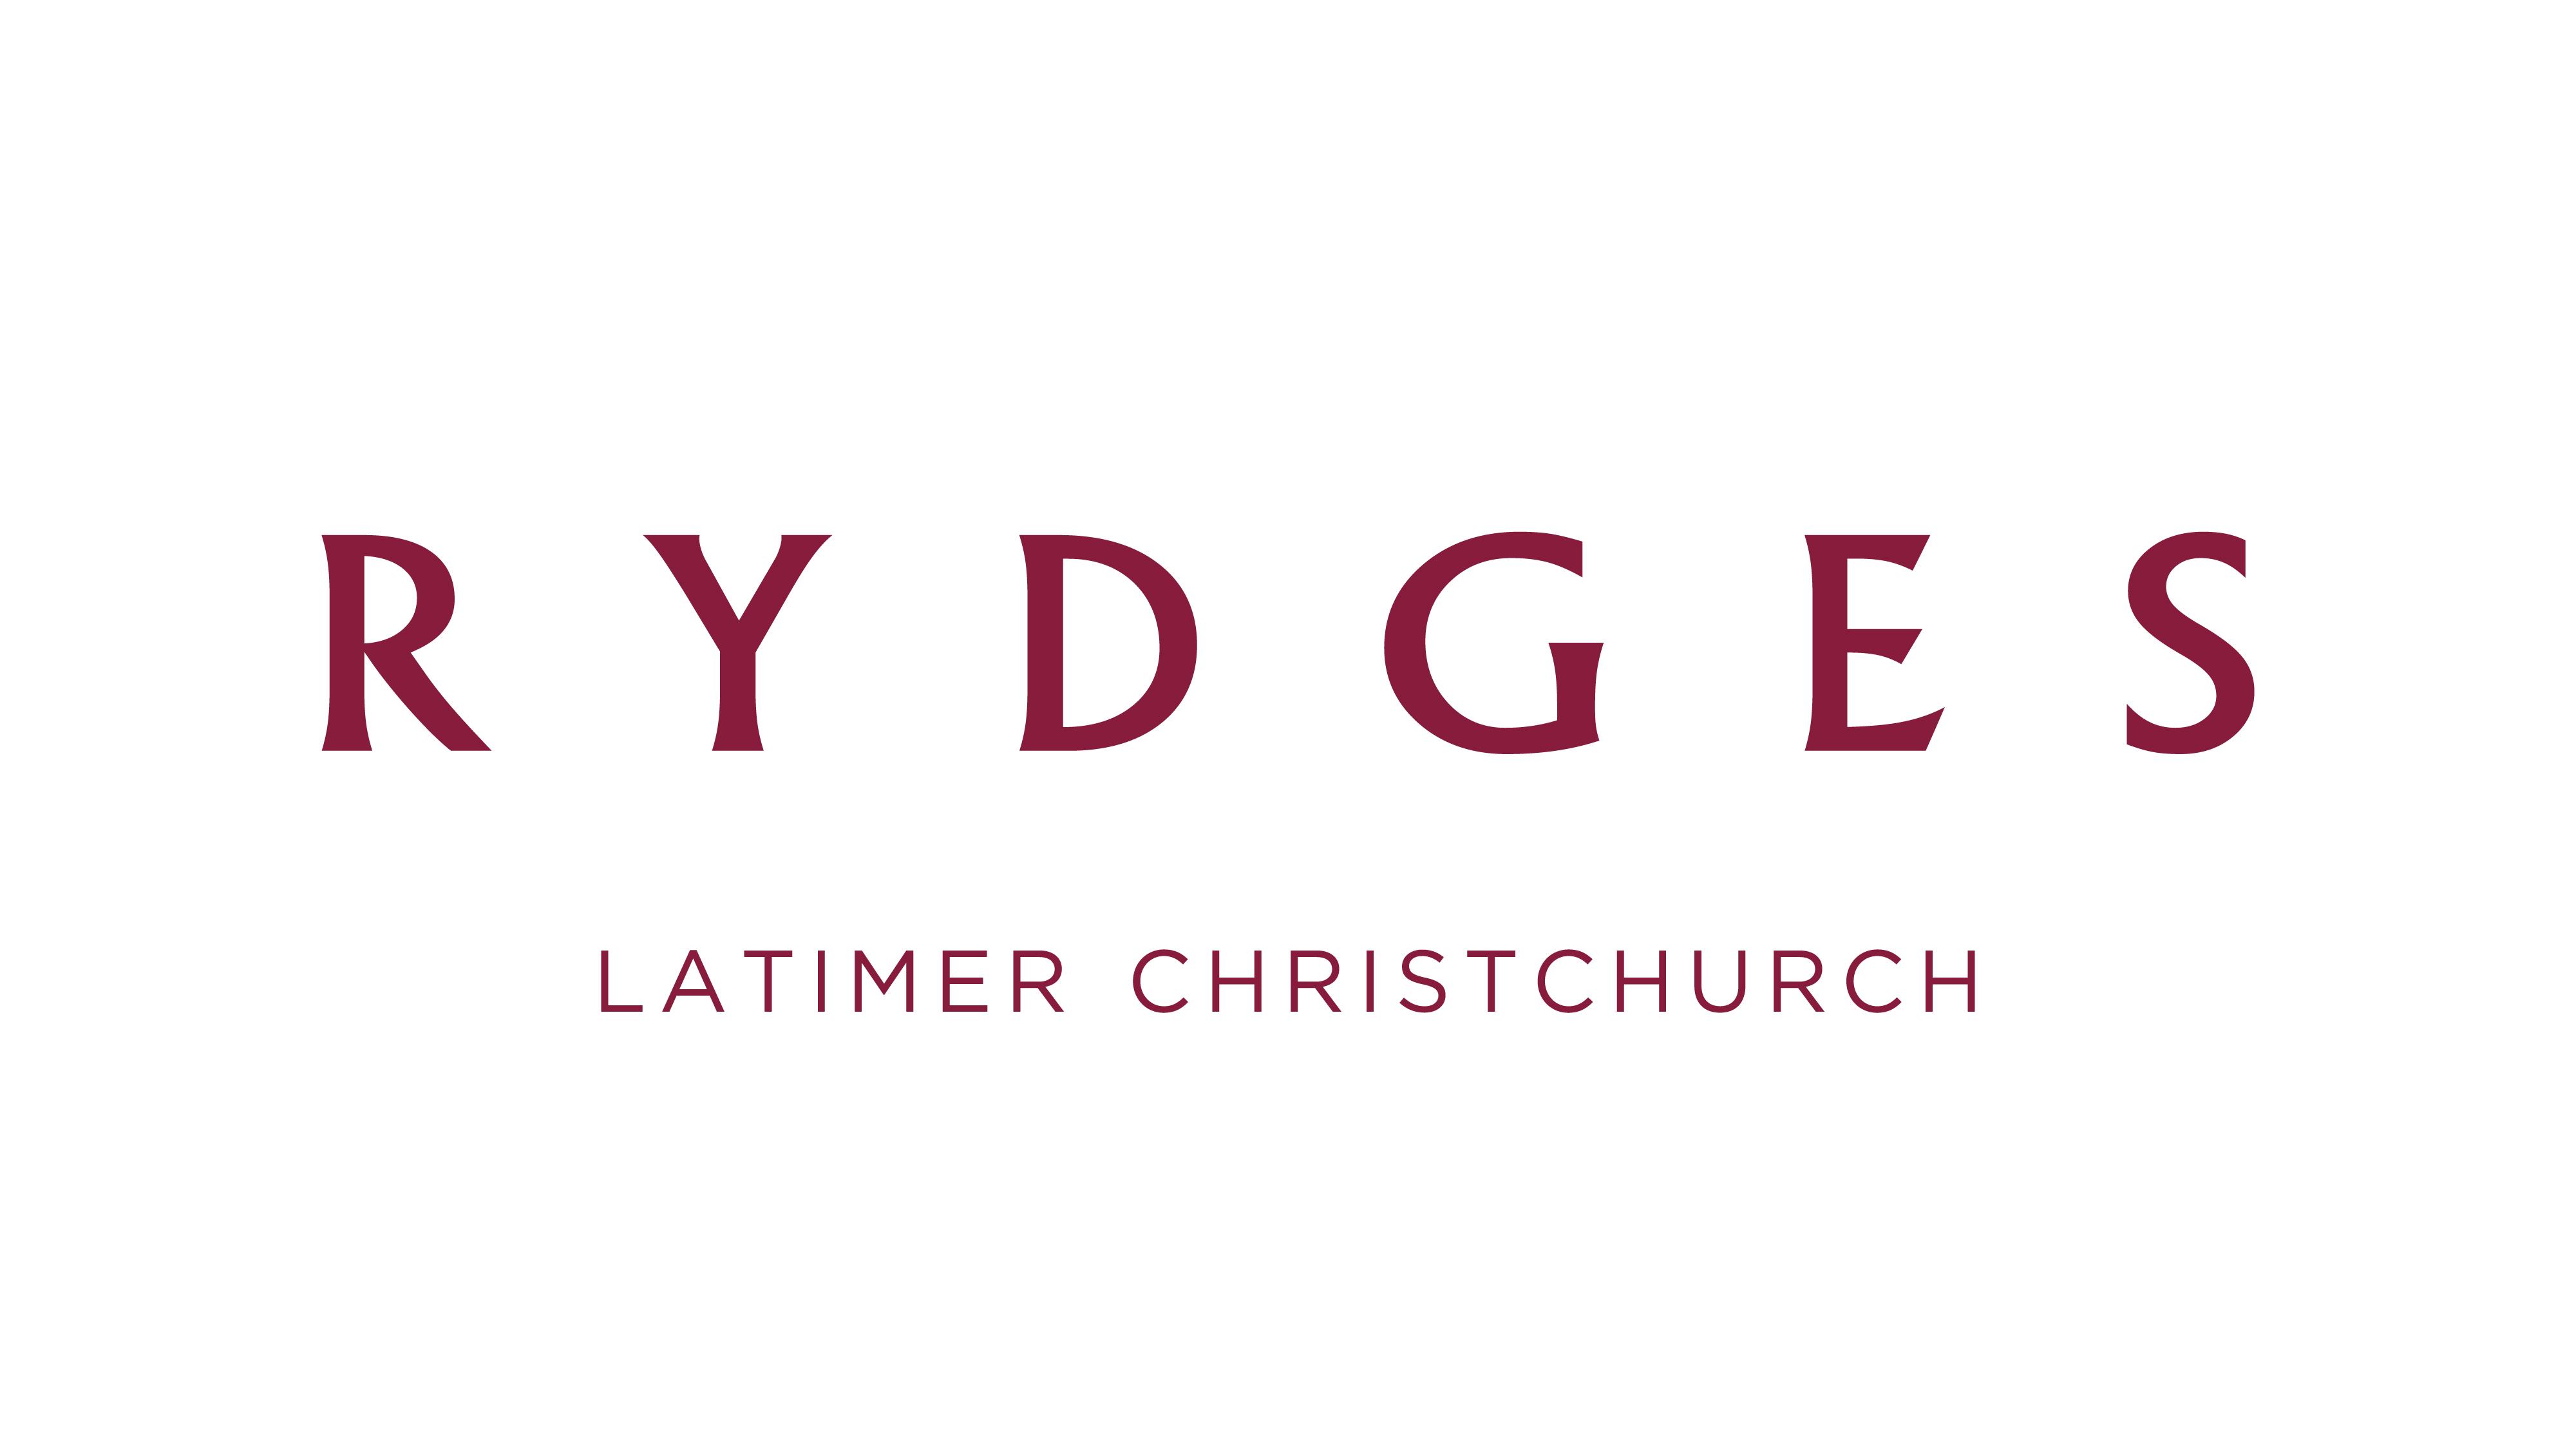 Rydges Latimer Christchurch